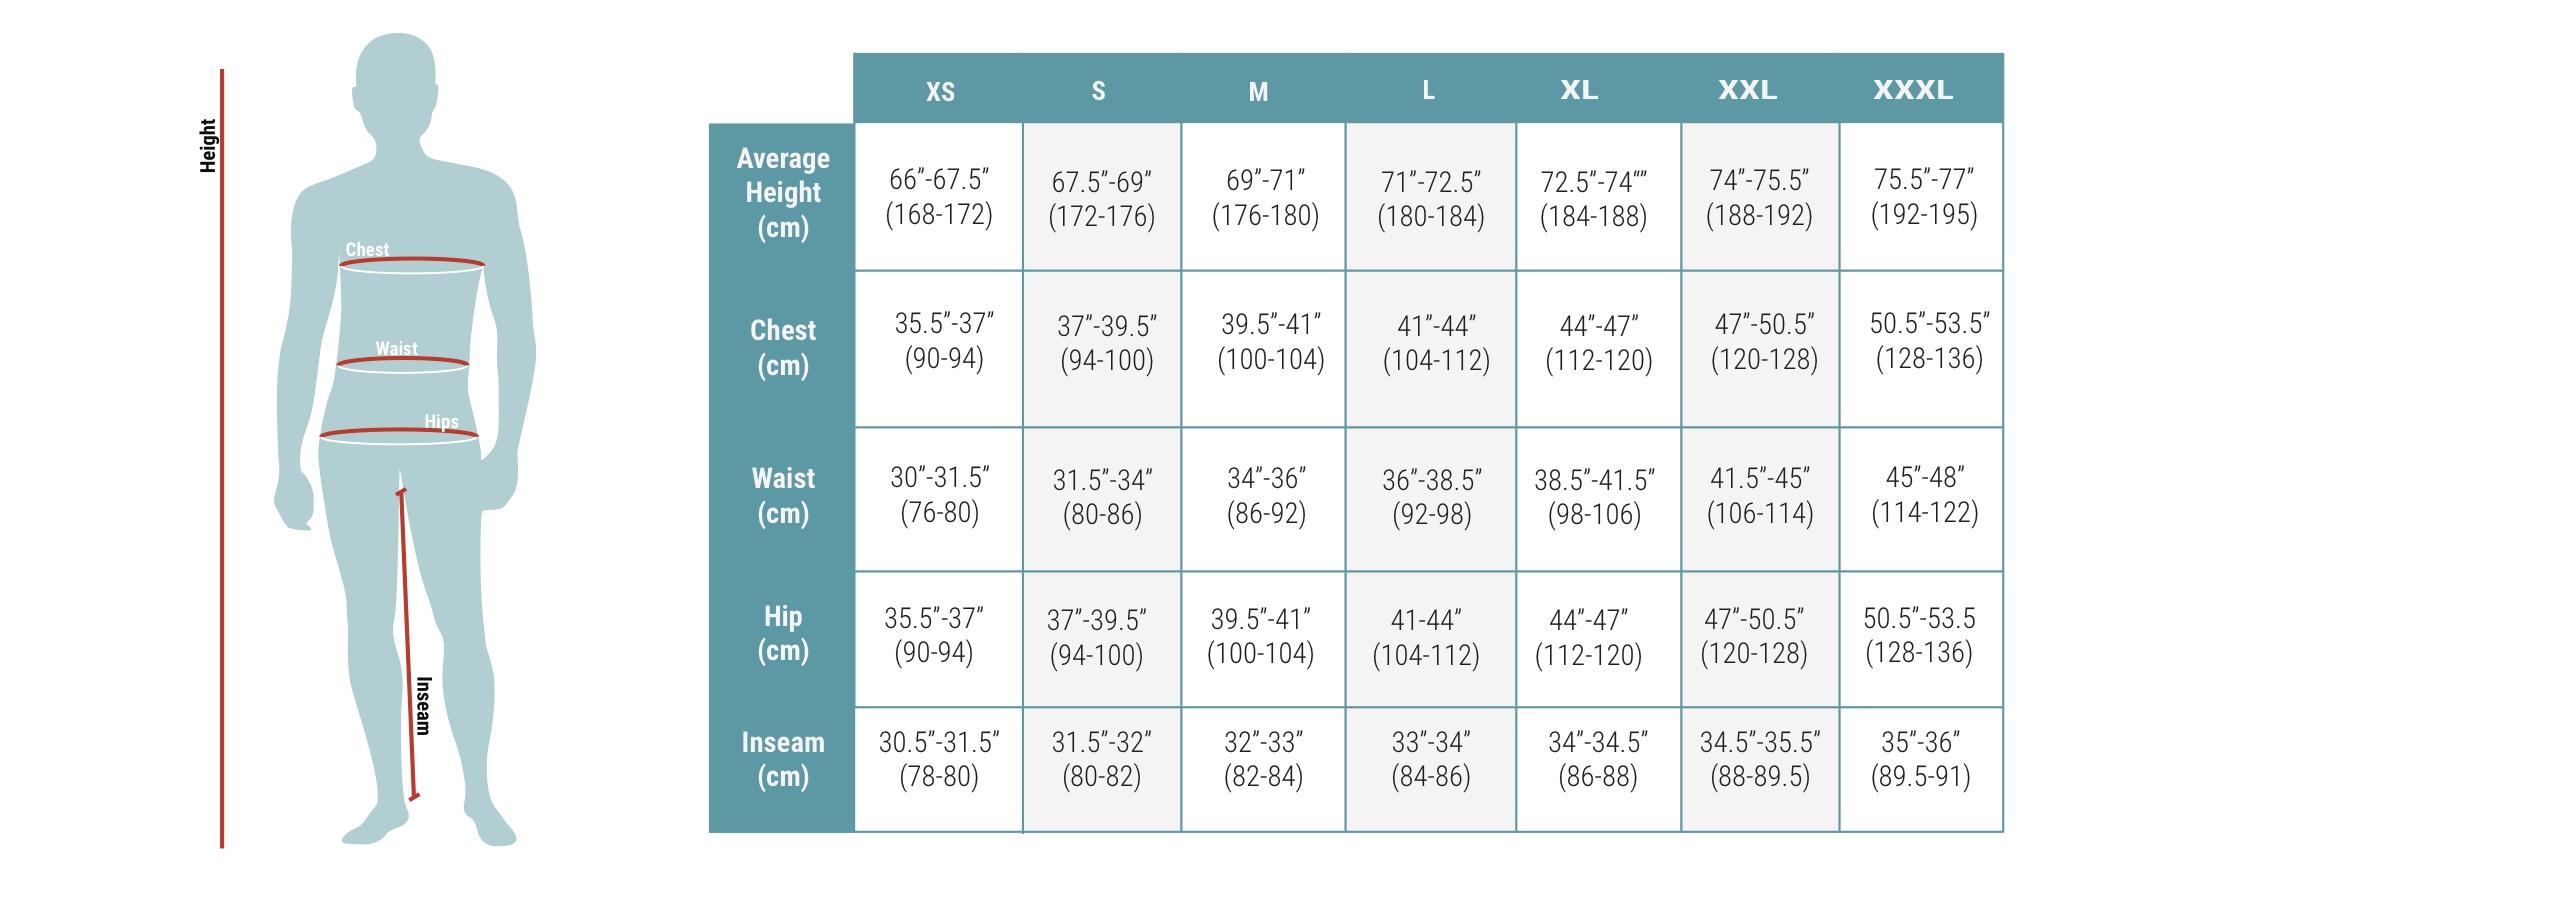 wcs-hh-mens-sizing-chart.jpg